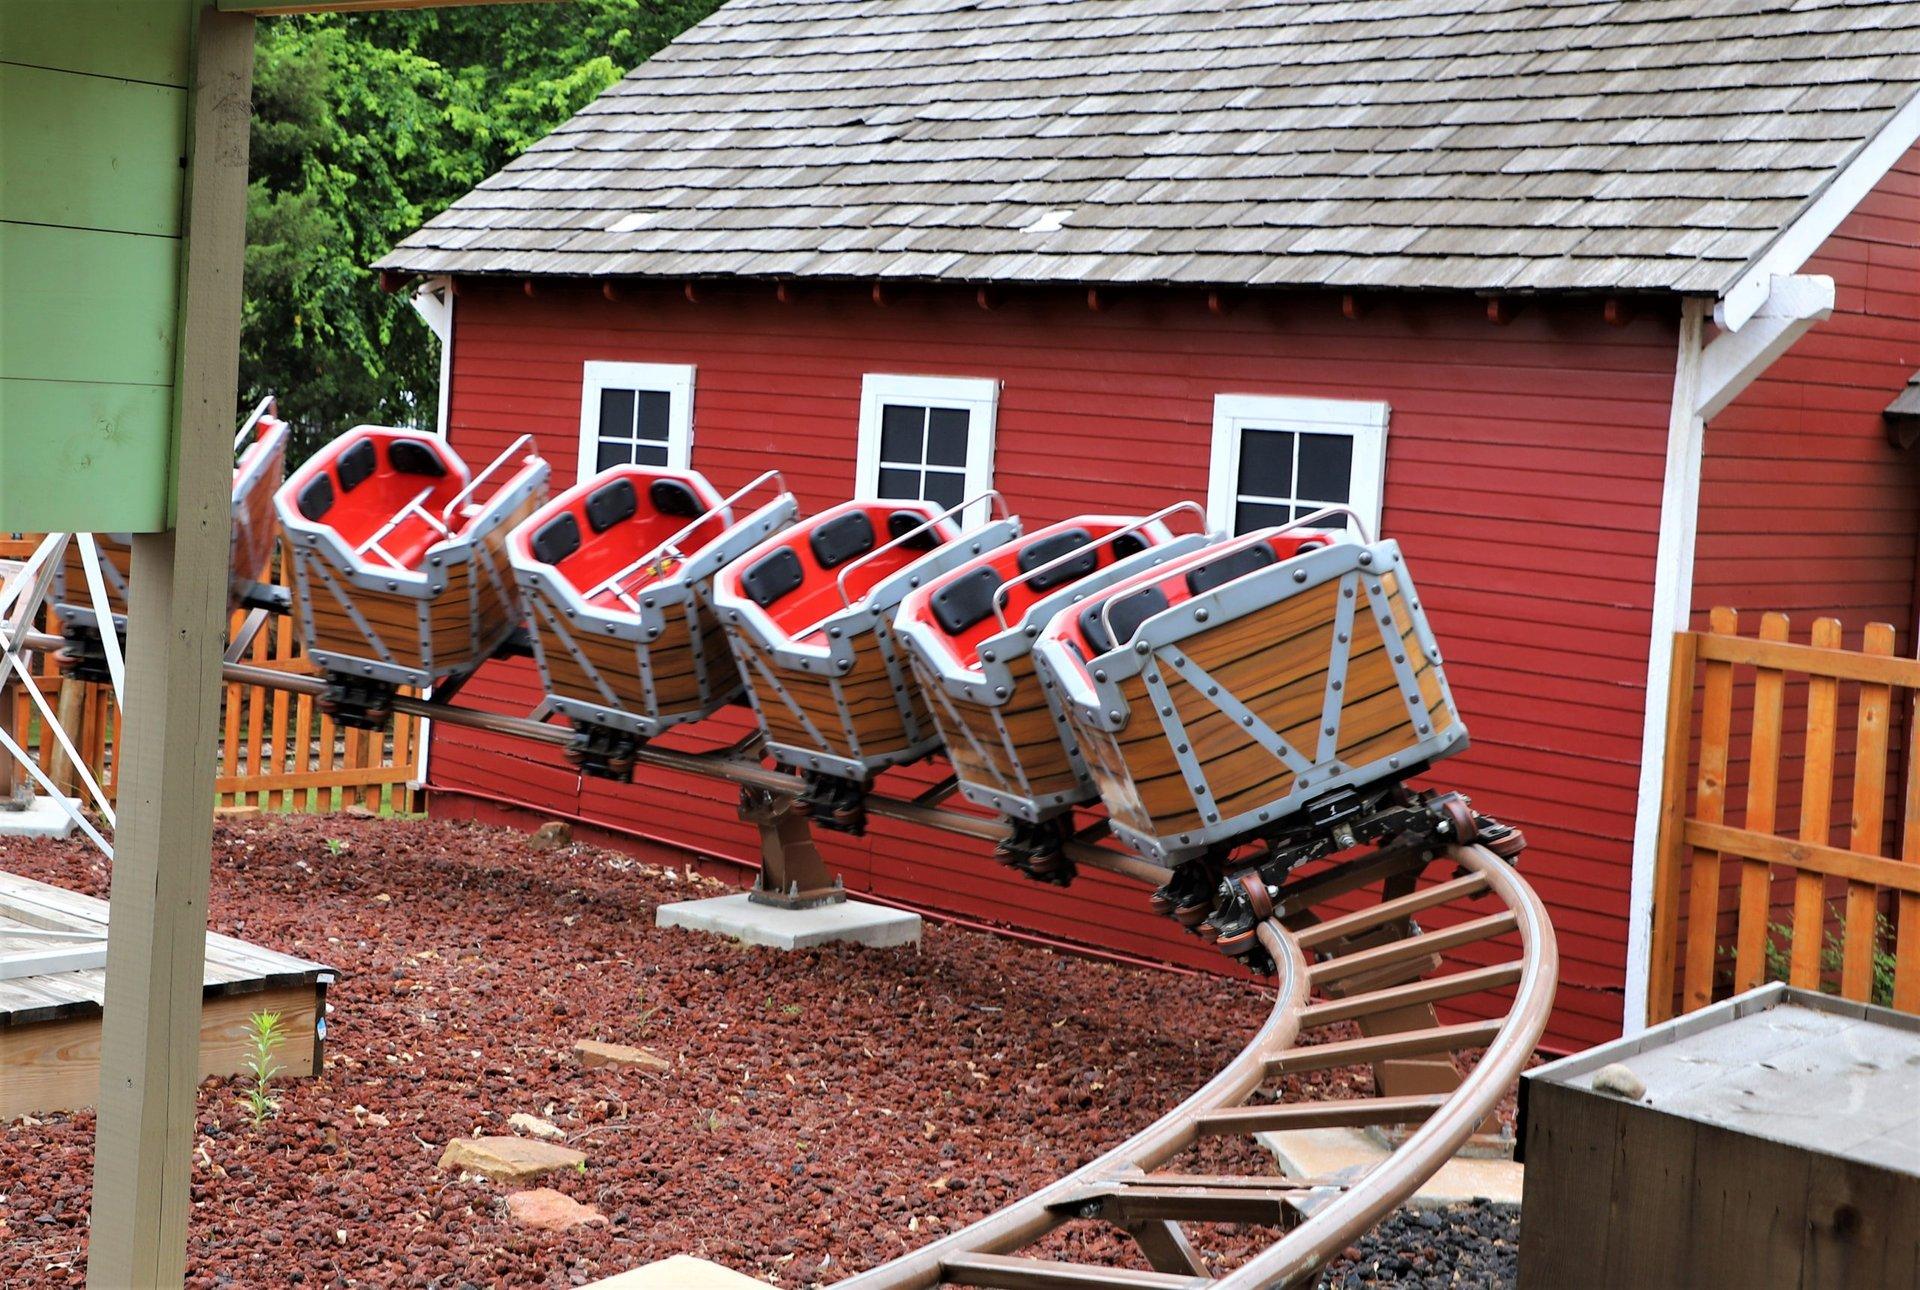 Frankie's Mine Train coaster